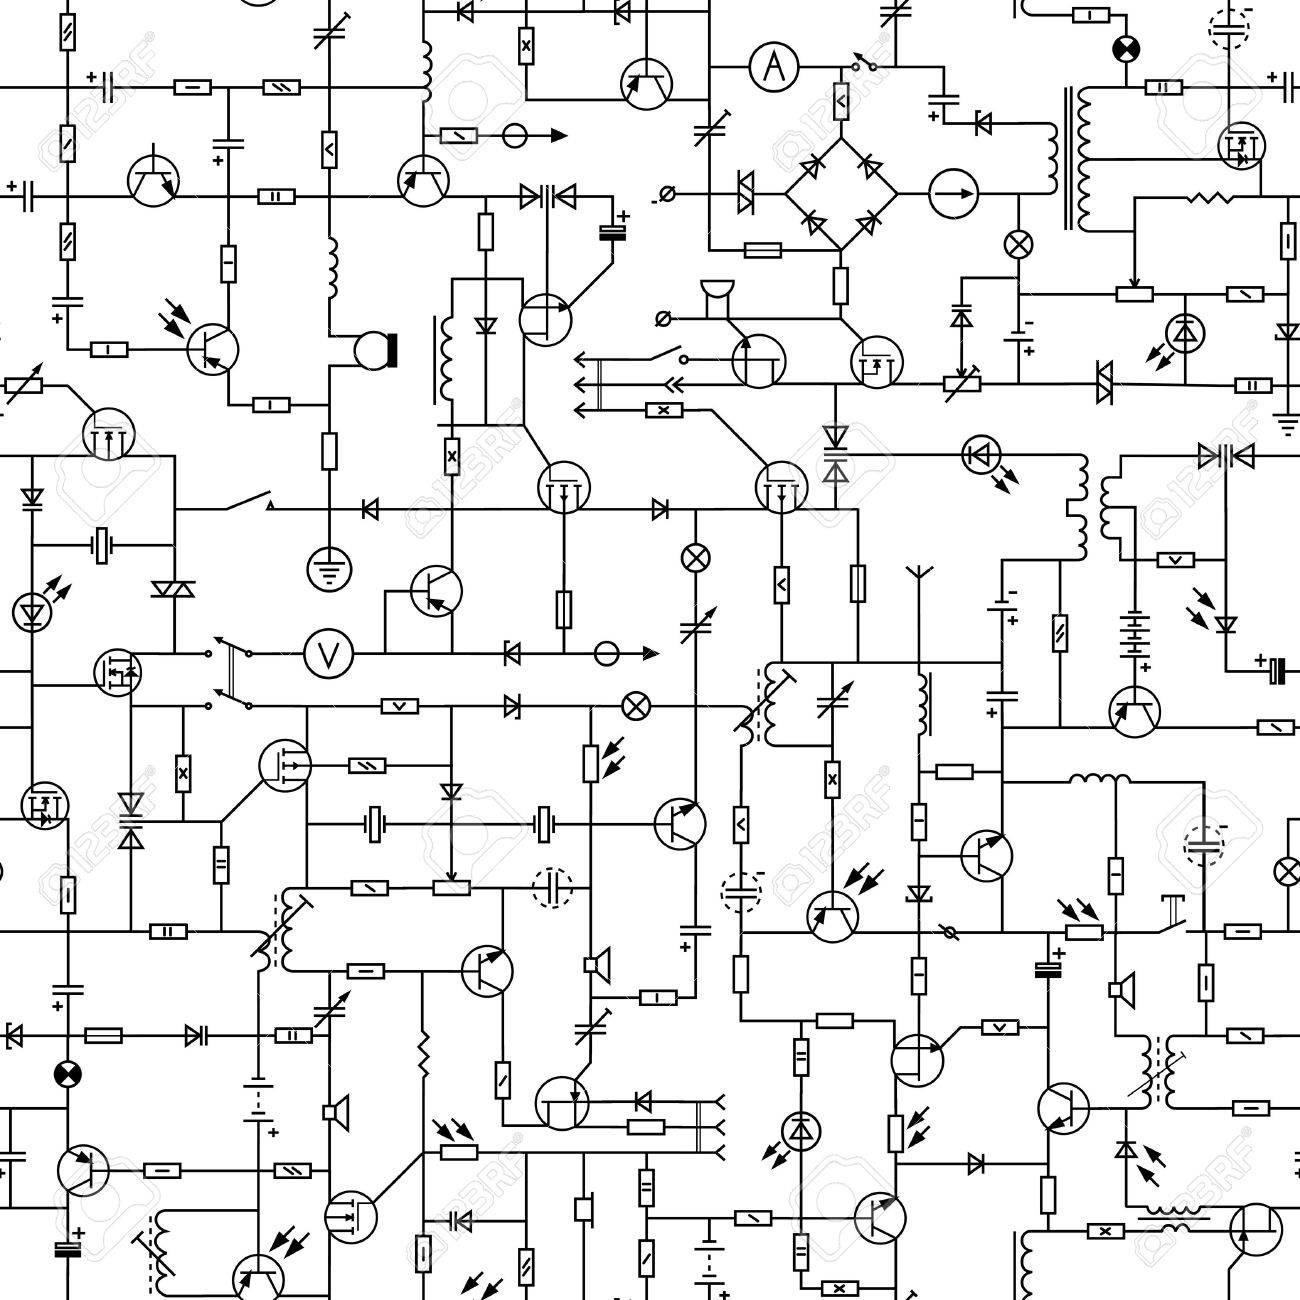 Draw Electric Circuit Amusing Symbols Electric Circuit Components Electrical Electronic